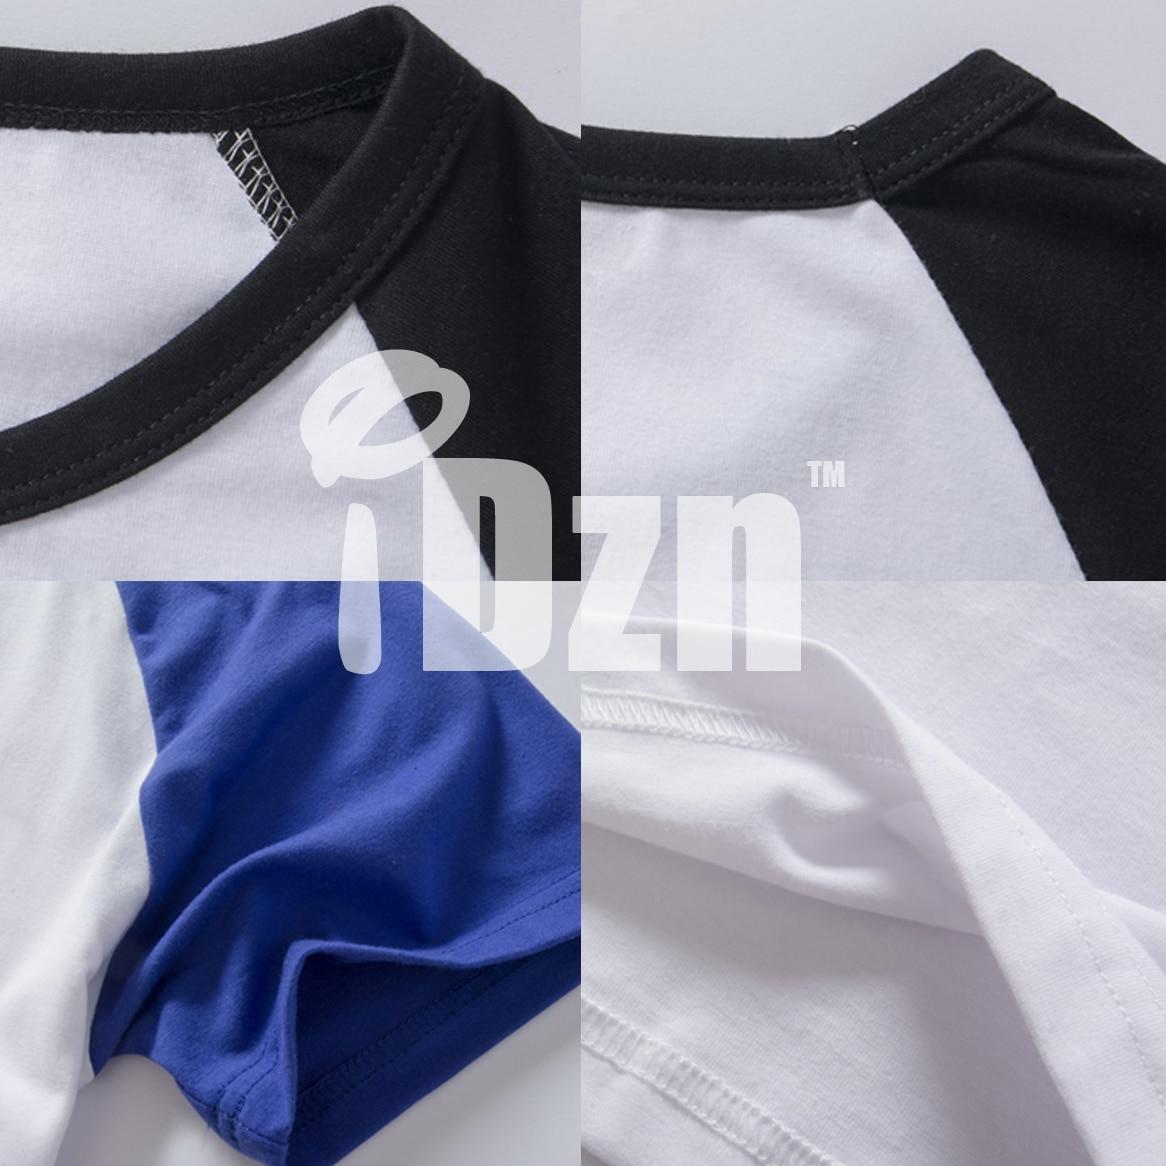 US $10 06 47% OFF|iDzn Unisex Summer T shirt TV show Top Gun The best in  best Callsigns Stag Party Fancy Short Sleeve Men T shirt Casual Tee Tops-in